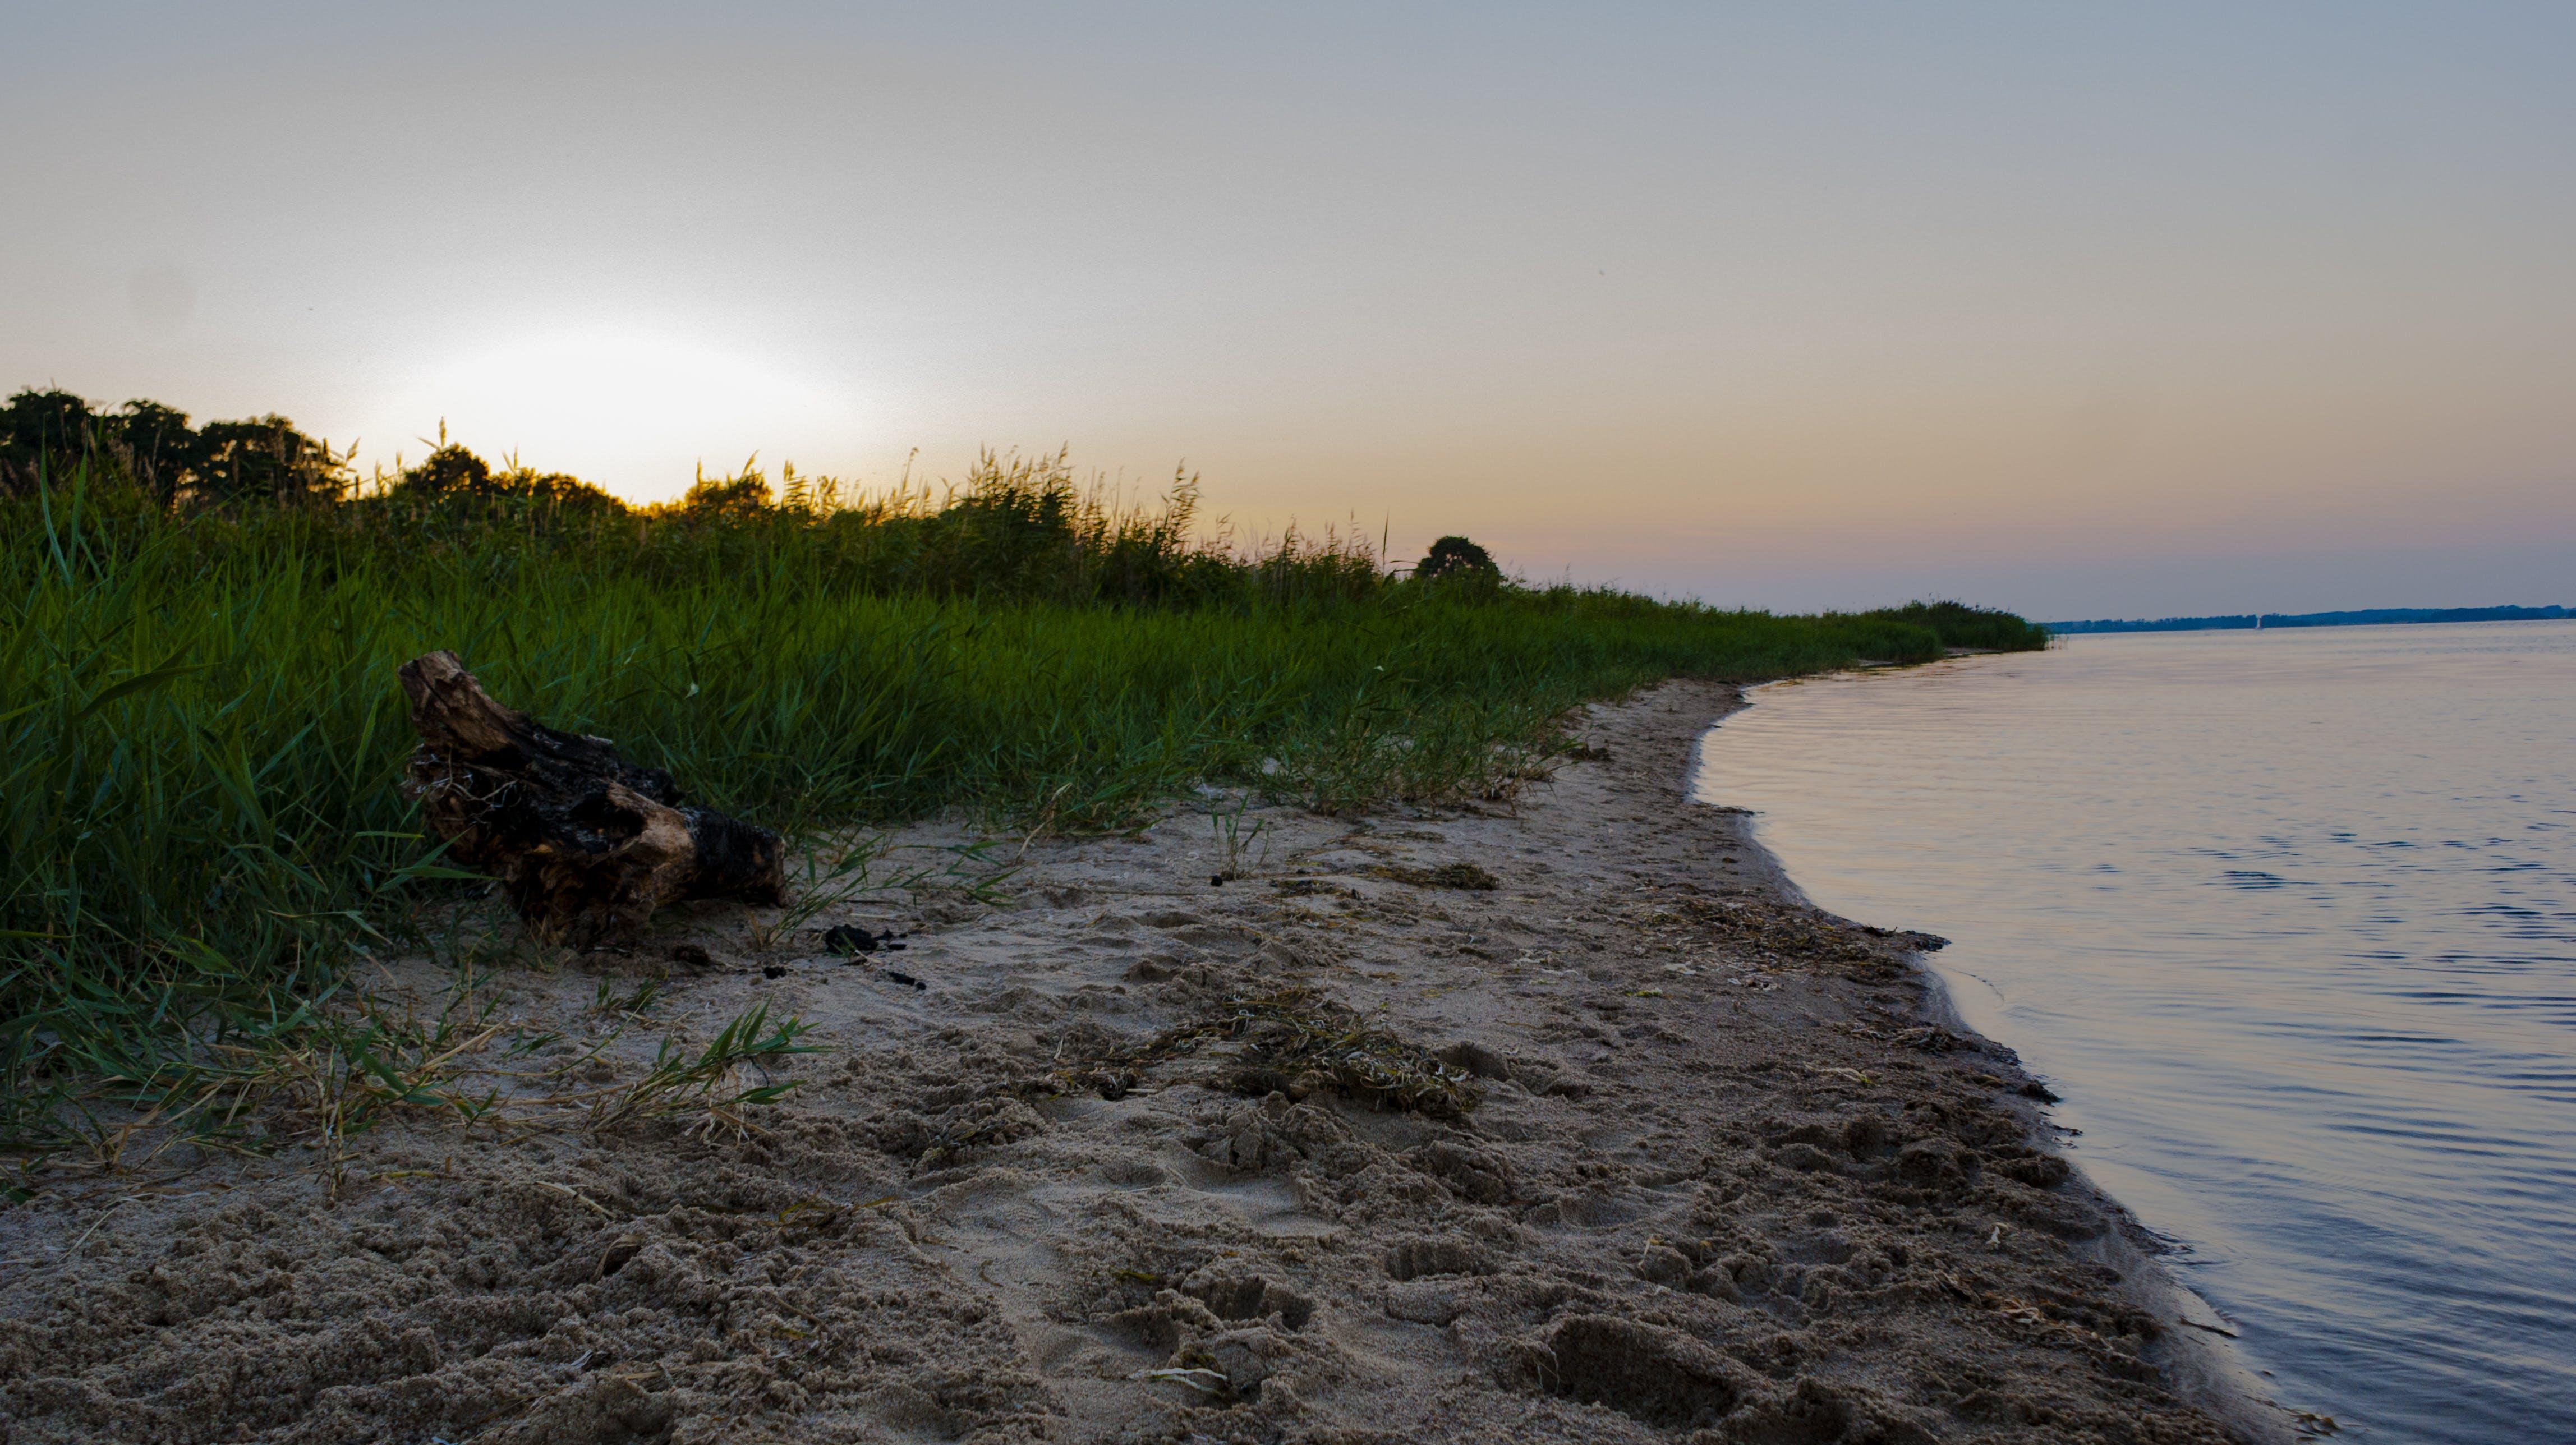 Free stock photo of blue water, open hearth, sand-beach, sea